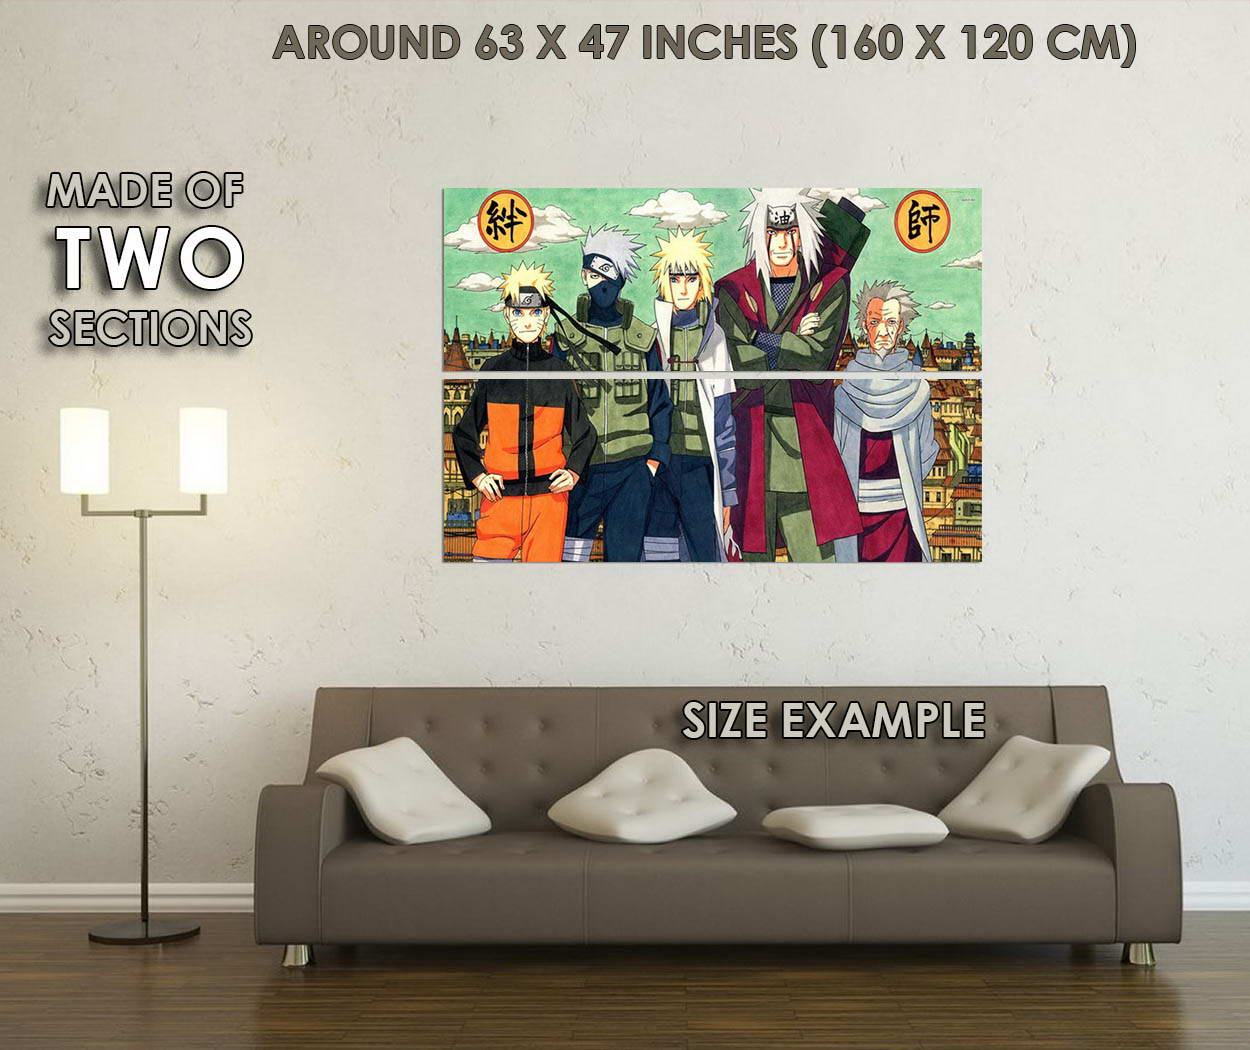 10609-Sasuke-Naruto-Shippuden-Anime-Game-LAMINATED-POSTER-CA thumbnail 6